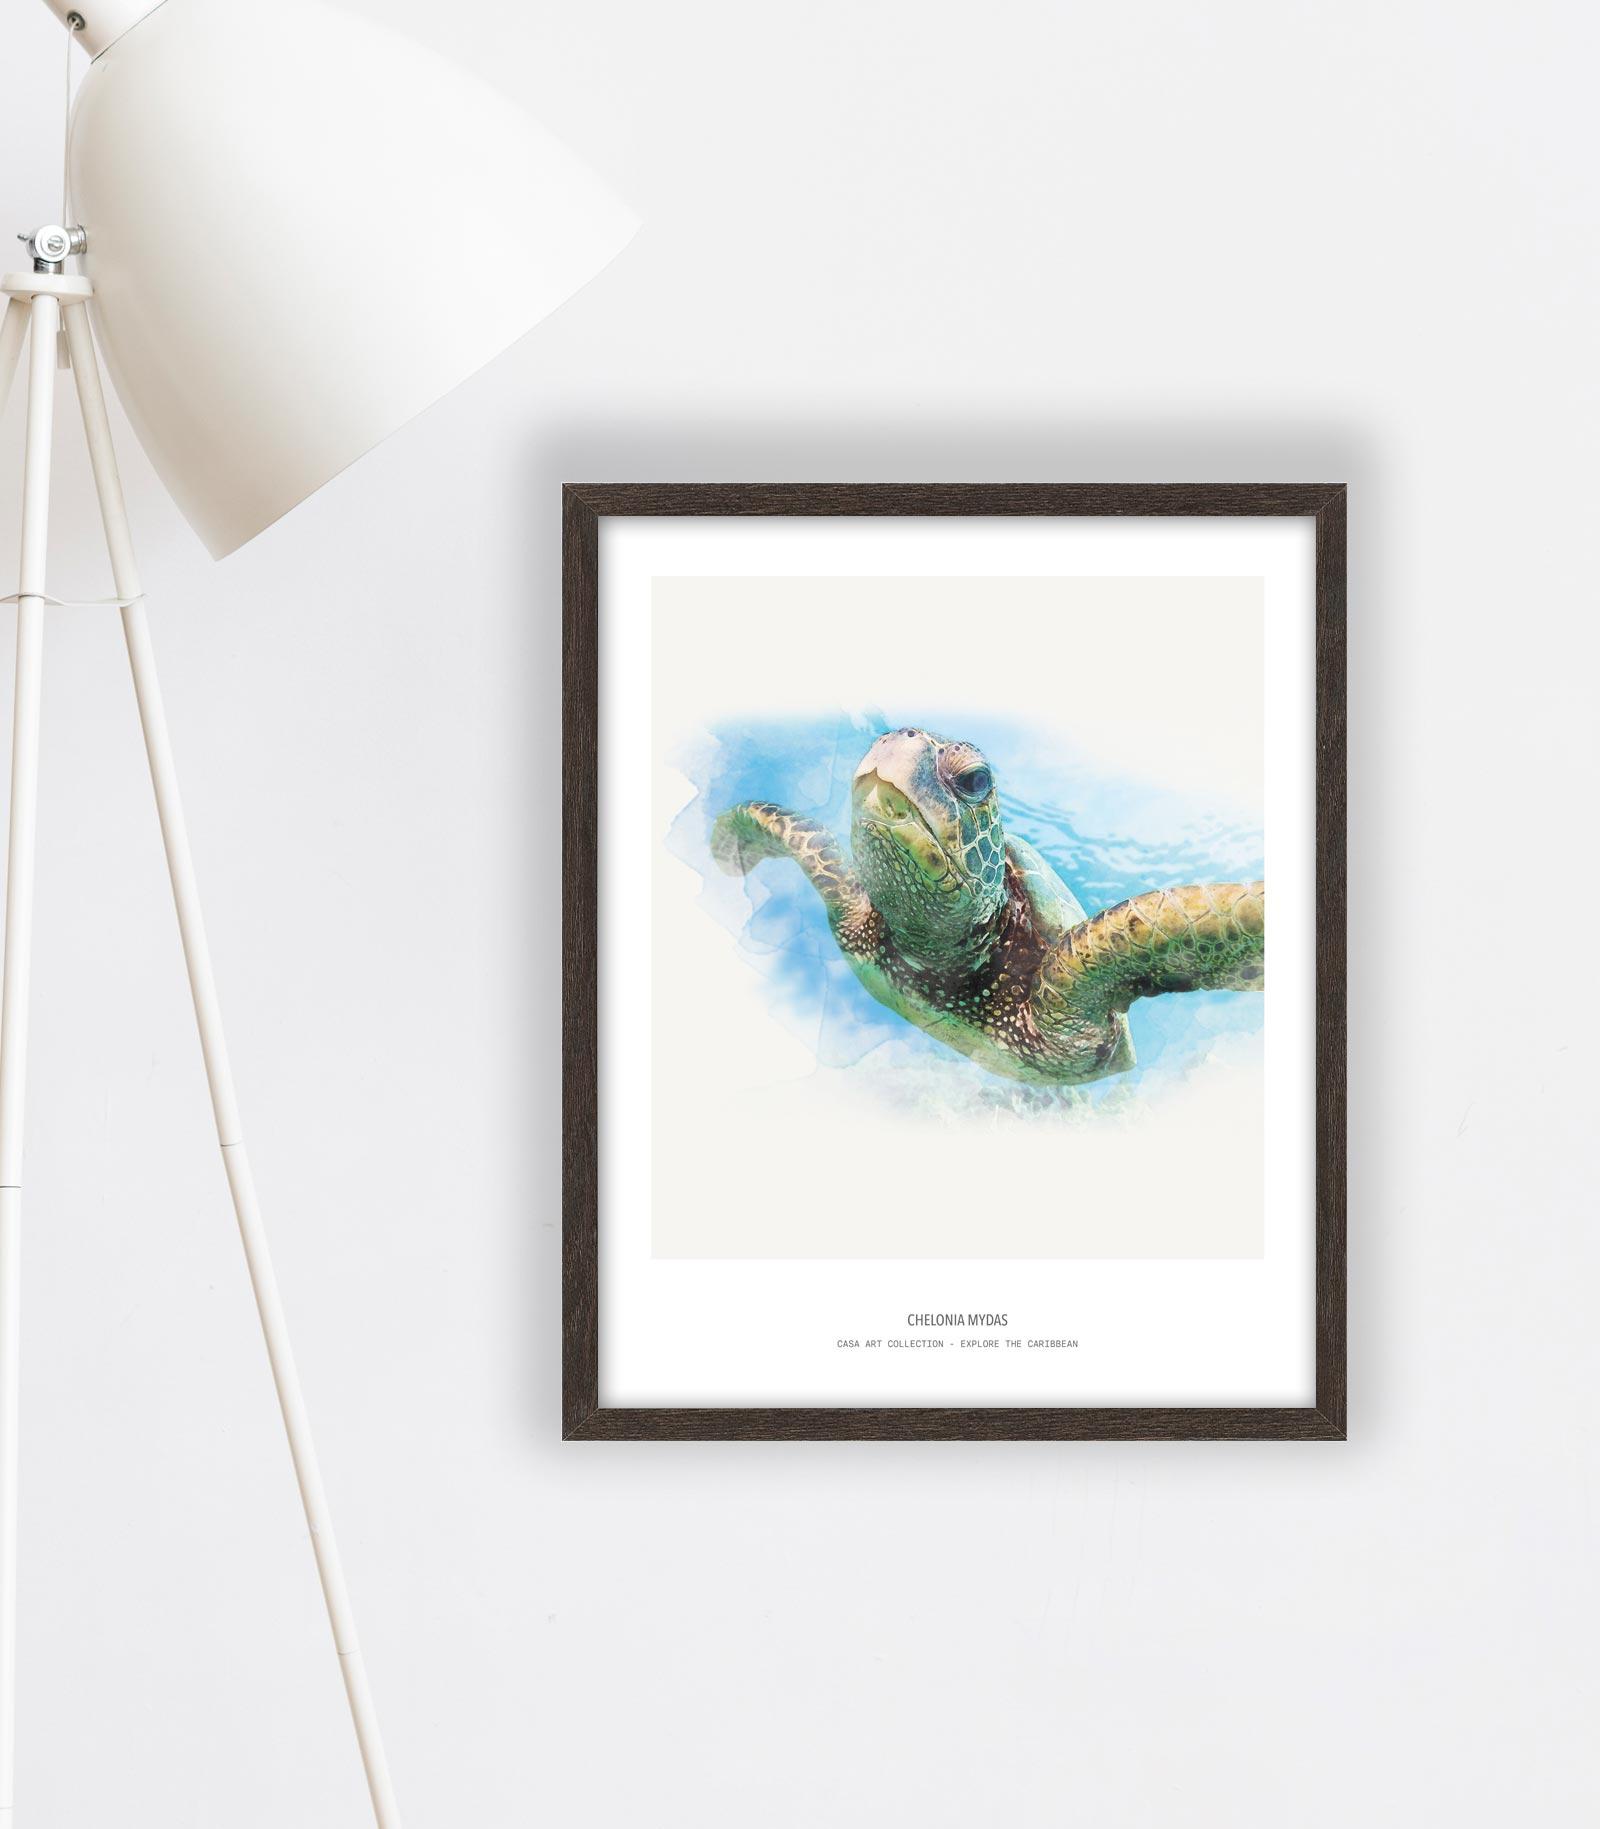 Caribbean art - Fine Art Printing - Explore the Caribbean - Kunst aan de muur